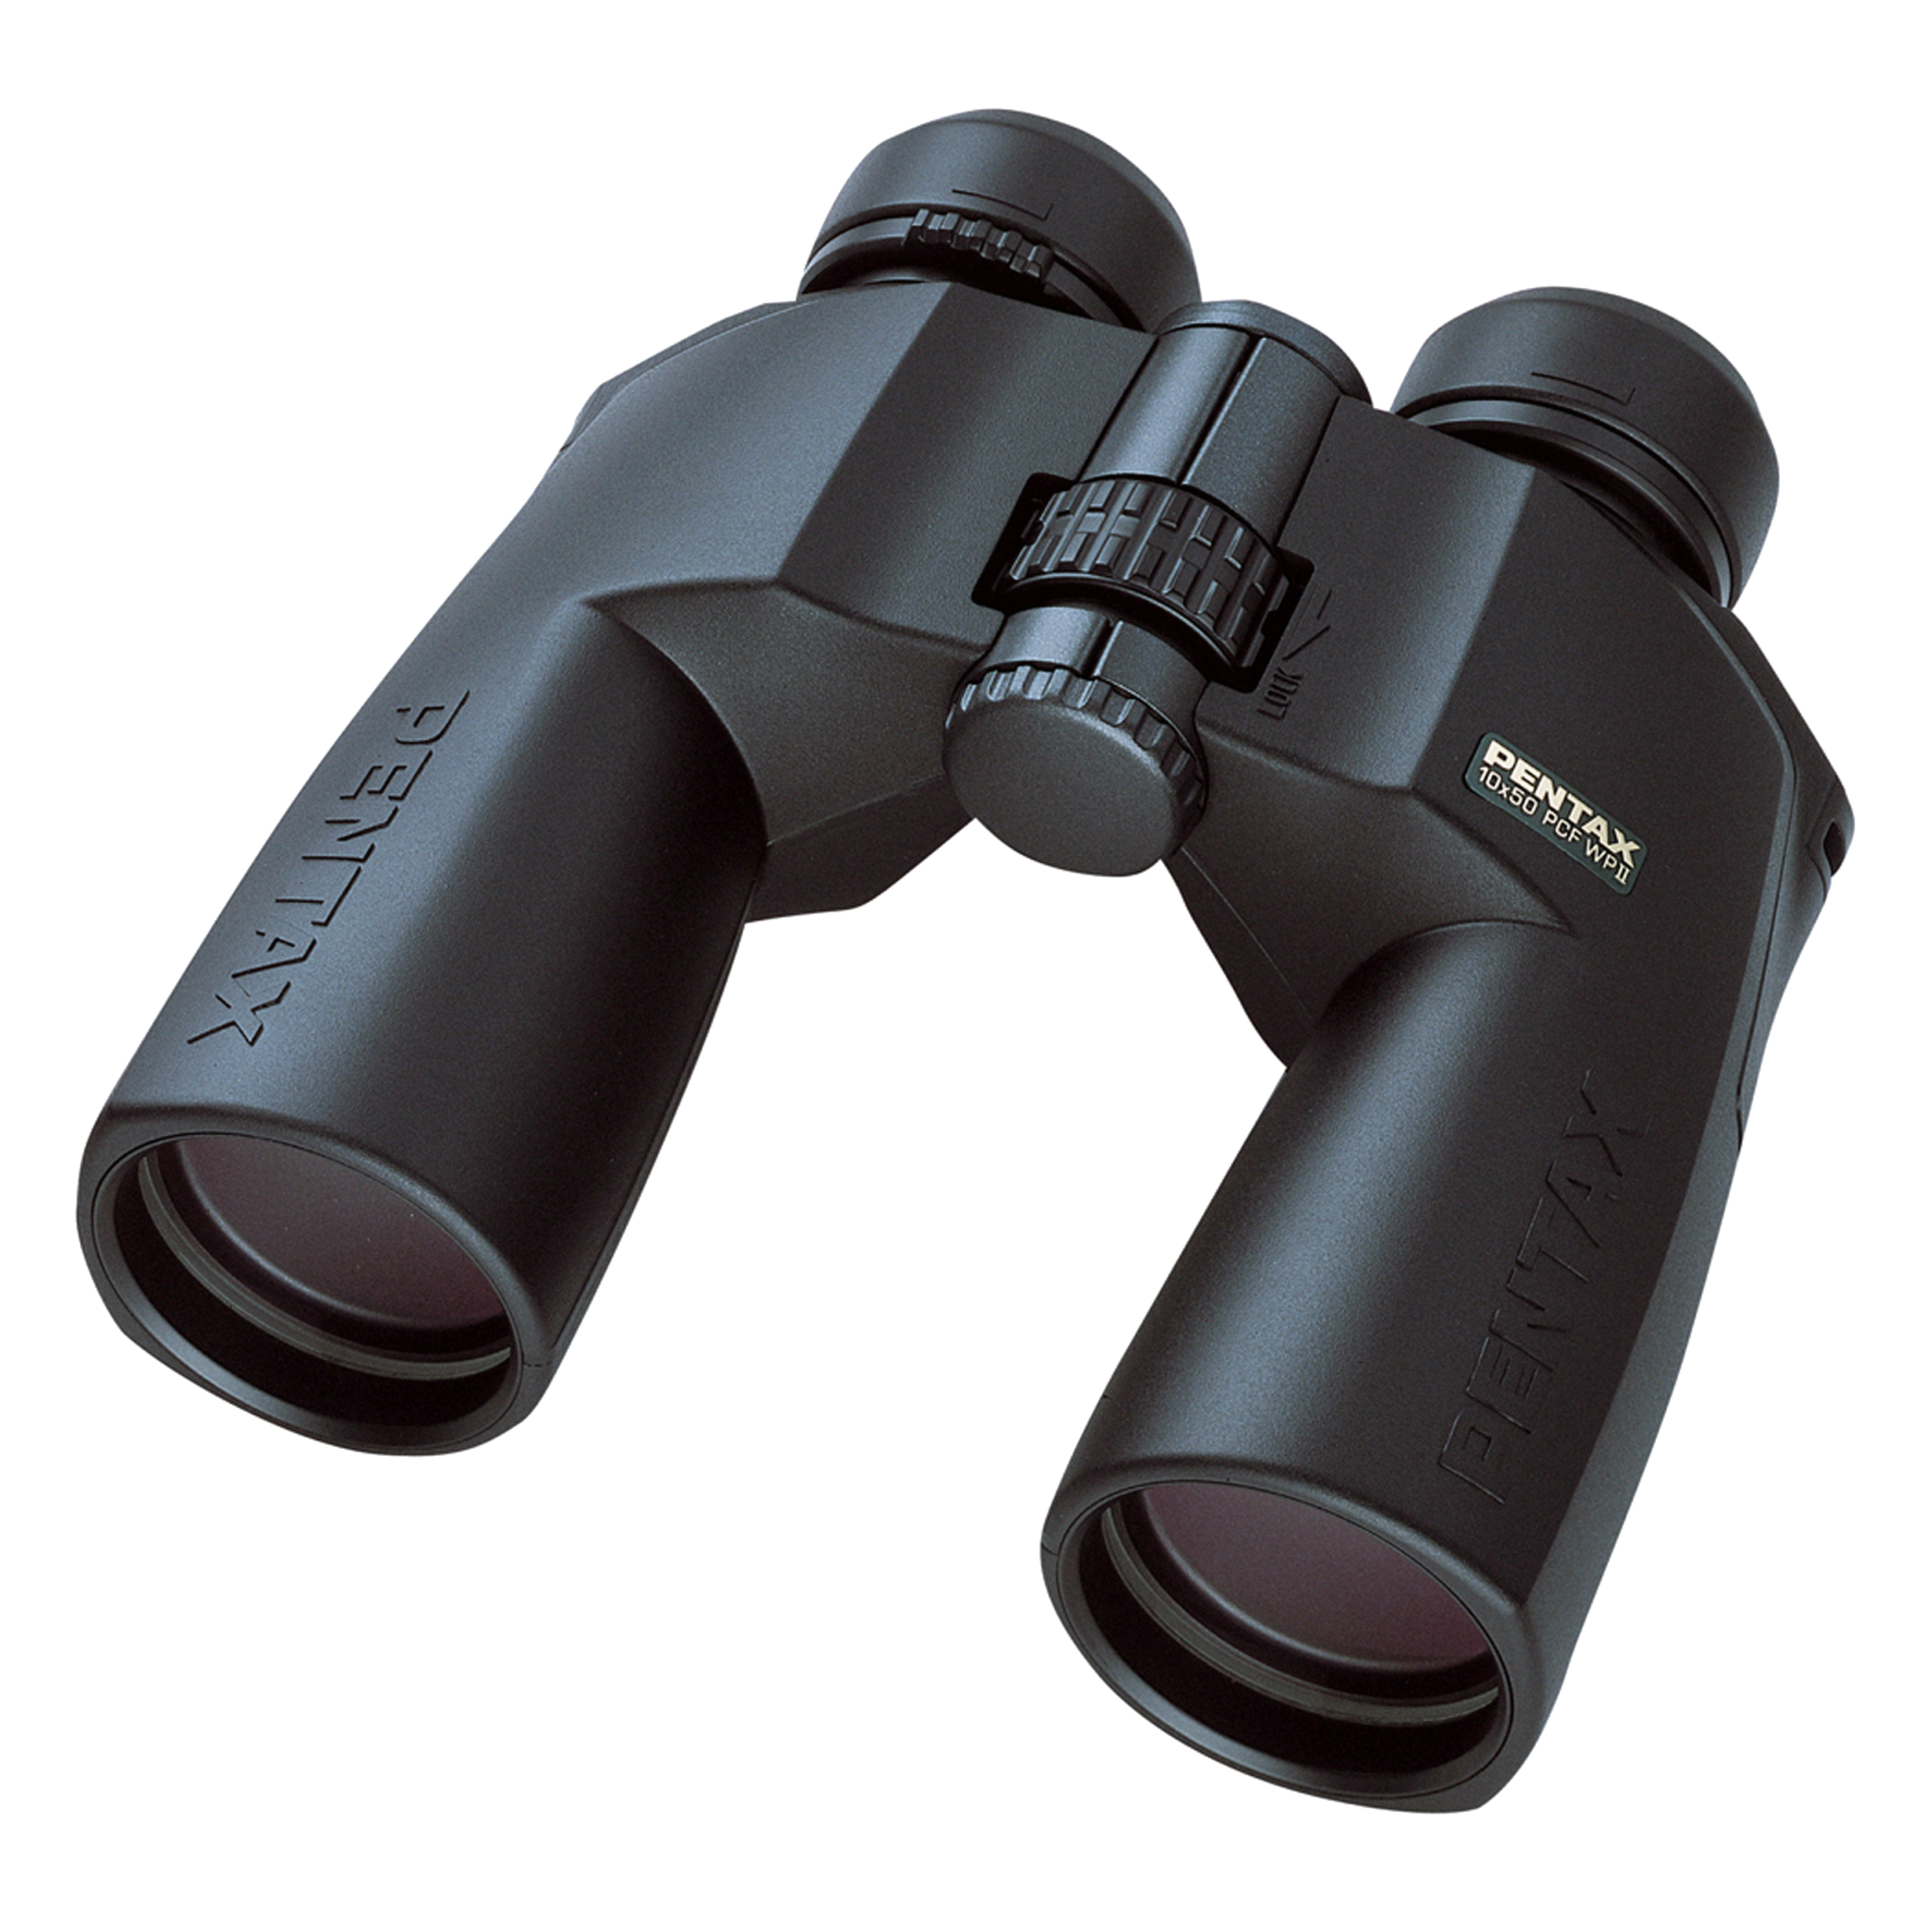 Focus clipart binoculars. Binocular png images free